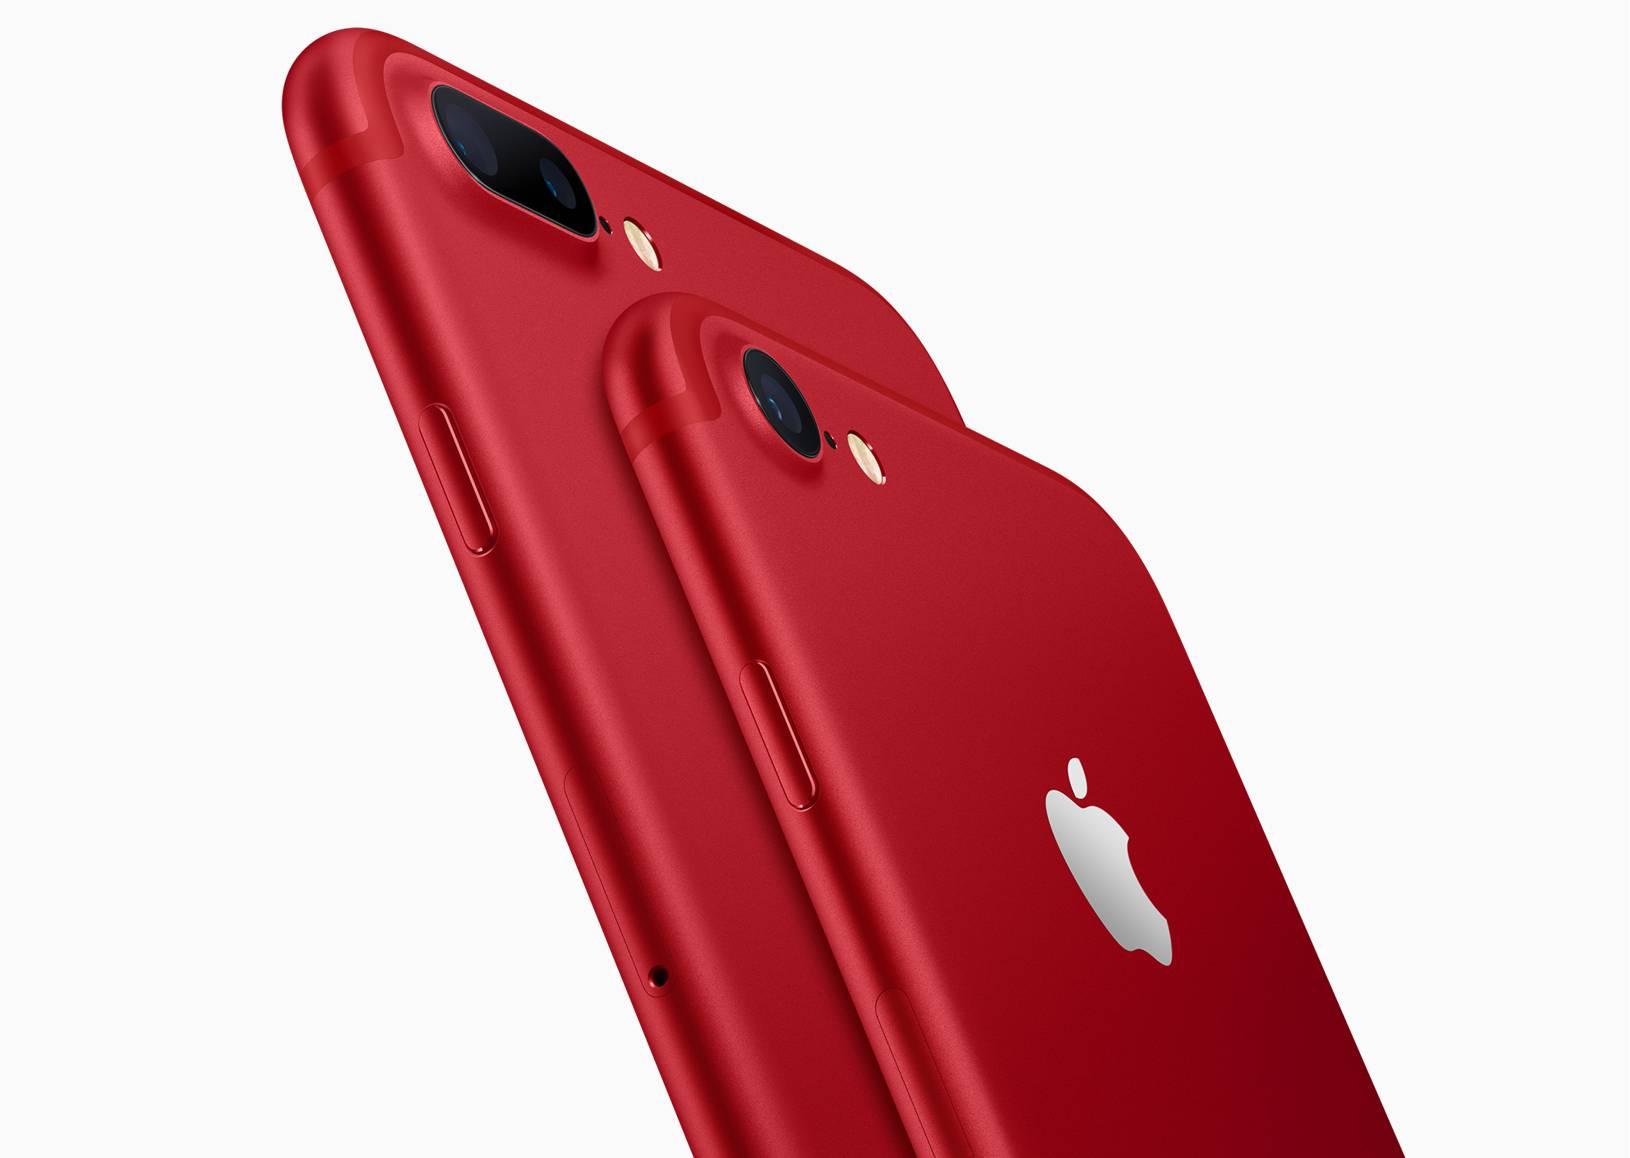 Crveni iPhone